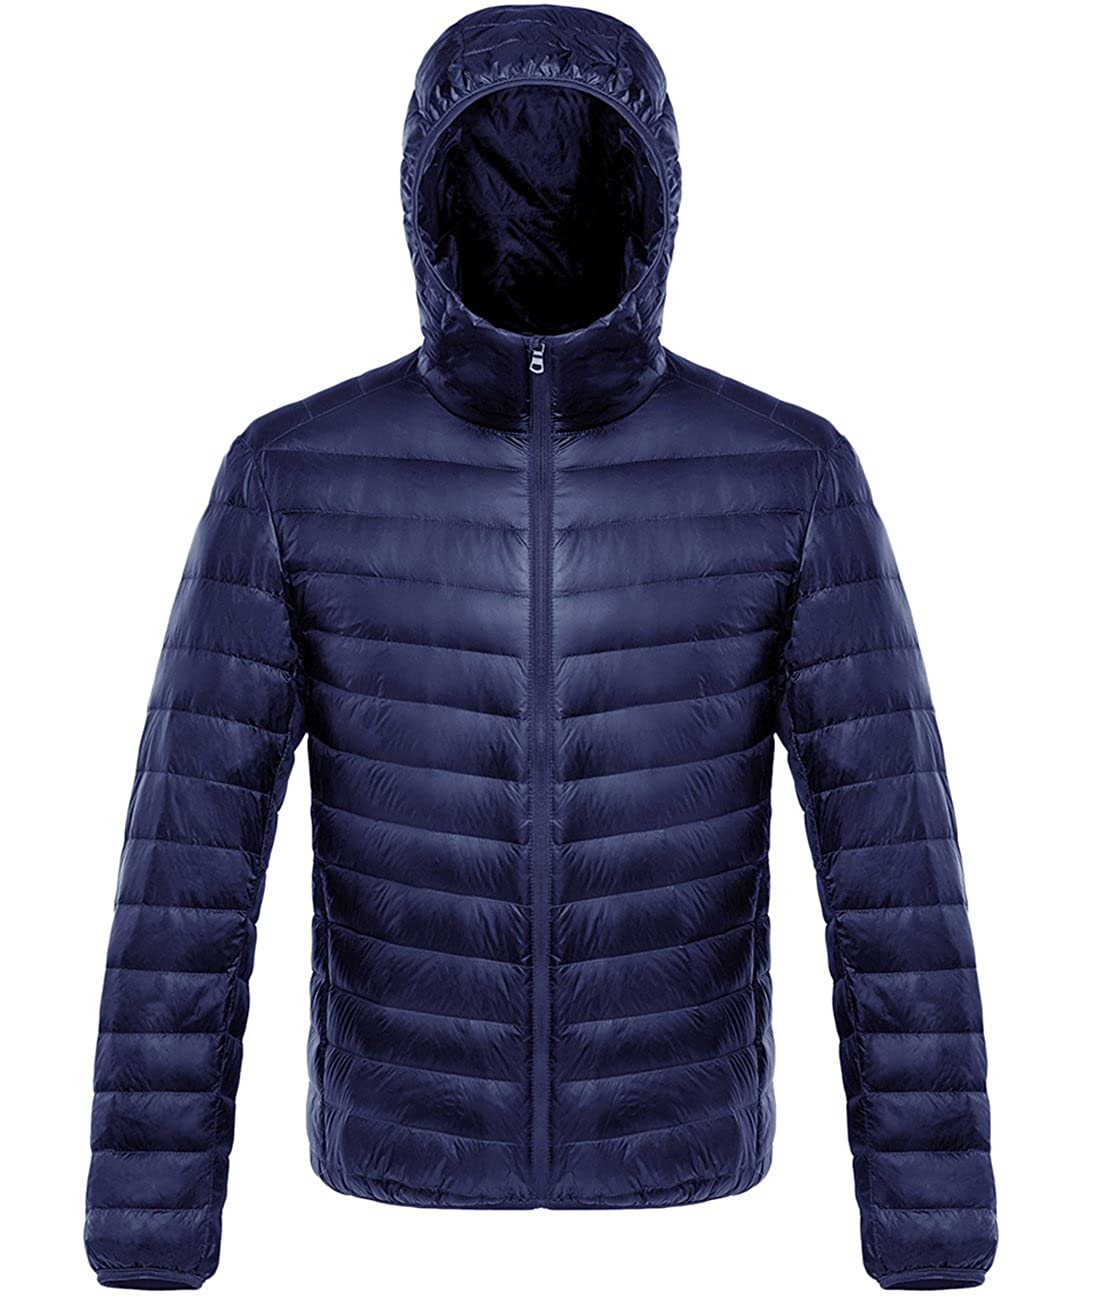 Yifun Outdoor Mens Hooded Packable Lightweight Down Jacket